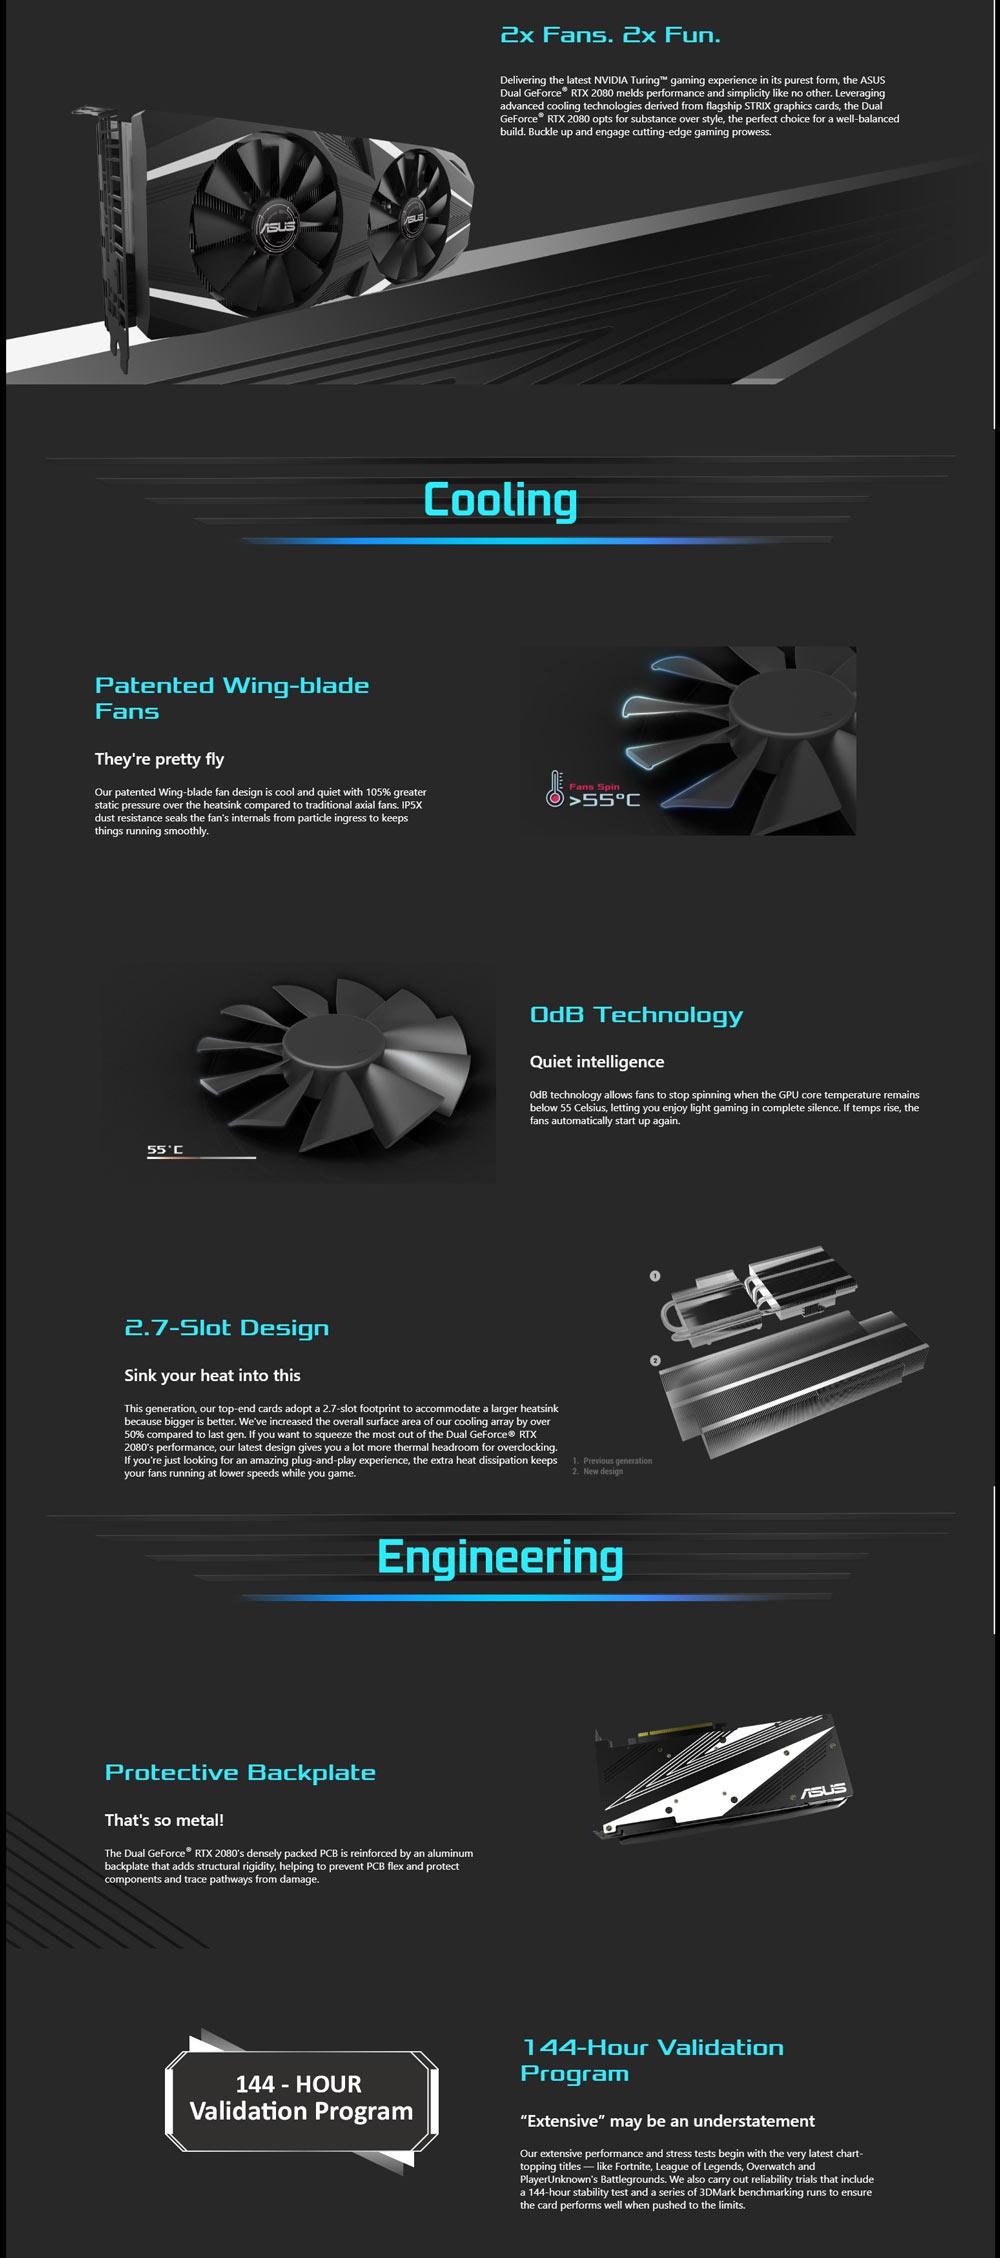 Asus RTX2080 Dual OC